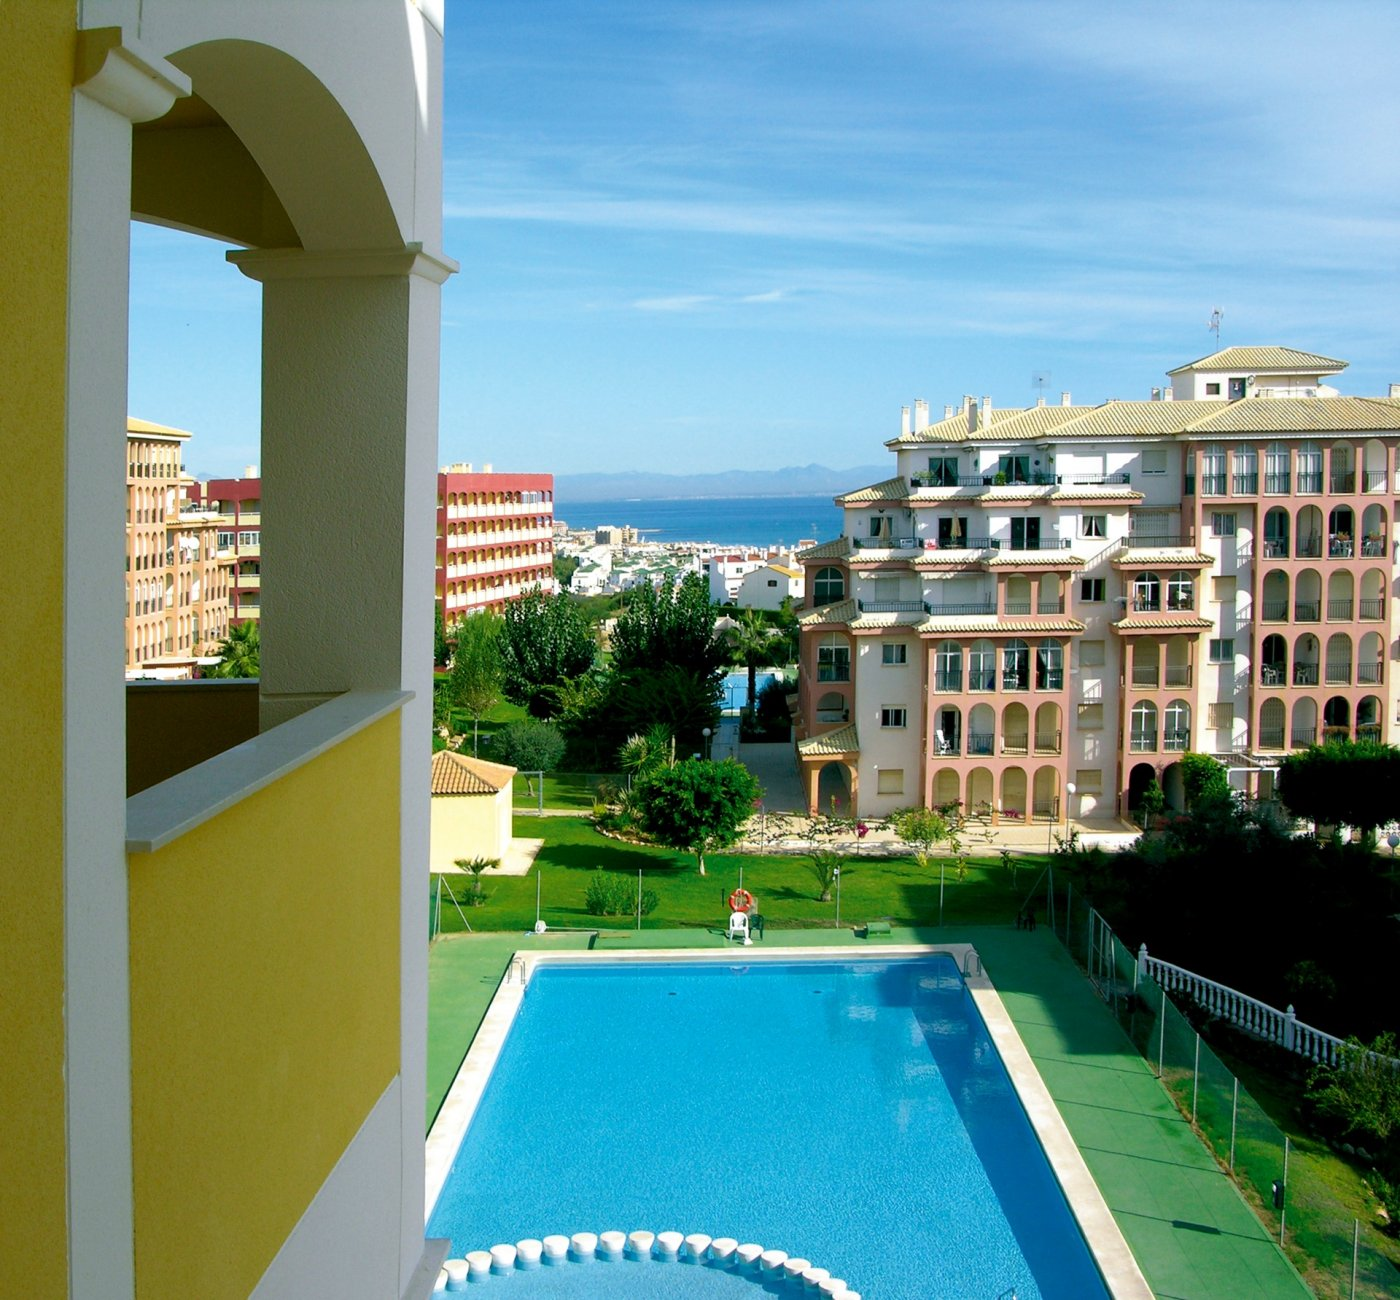 Appartement te koop in Torrevieja (Spanje, Costa Blanca)